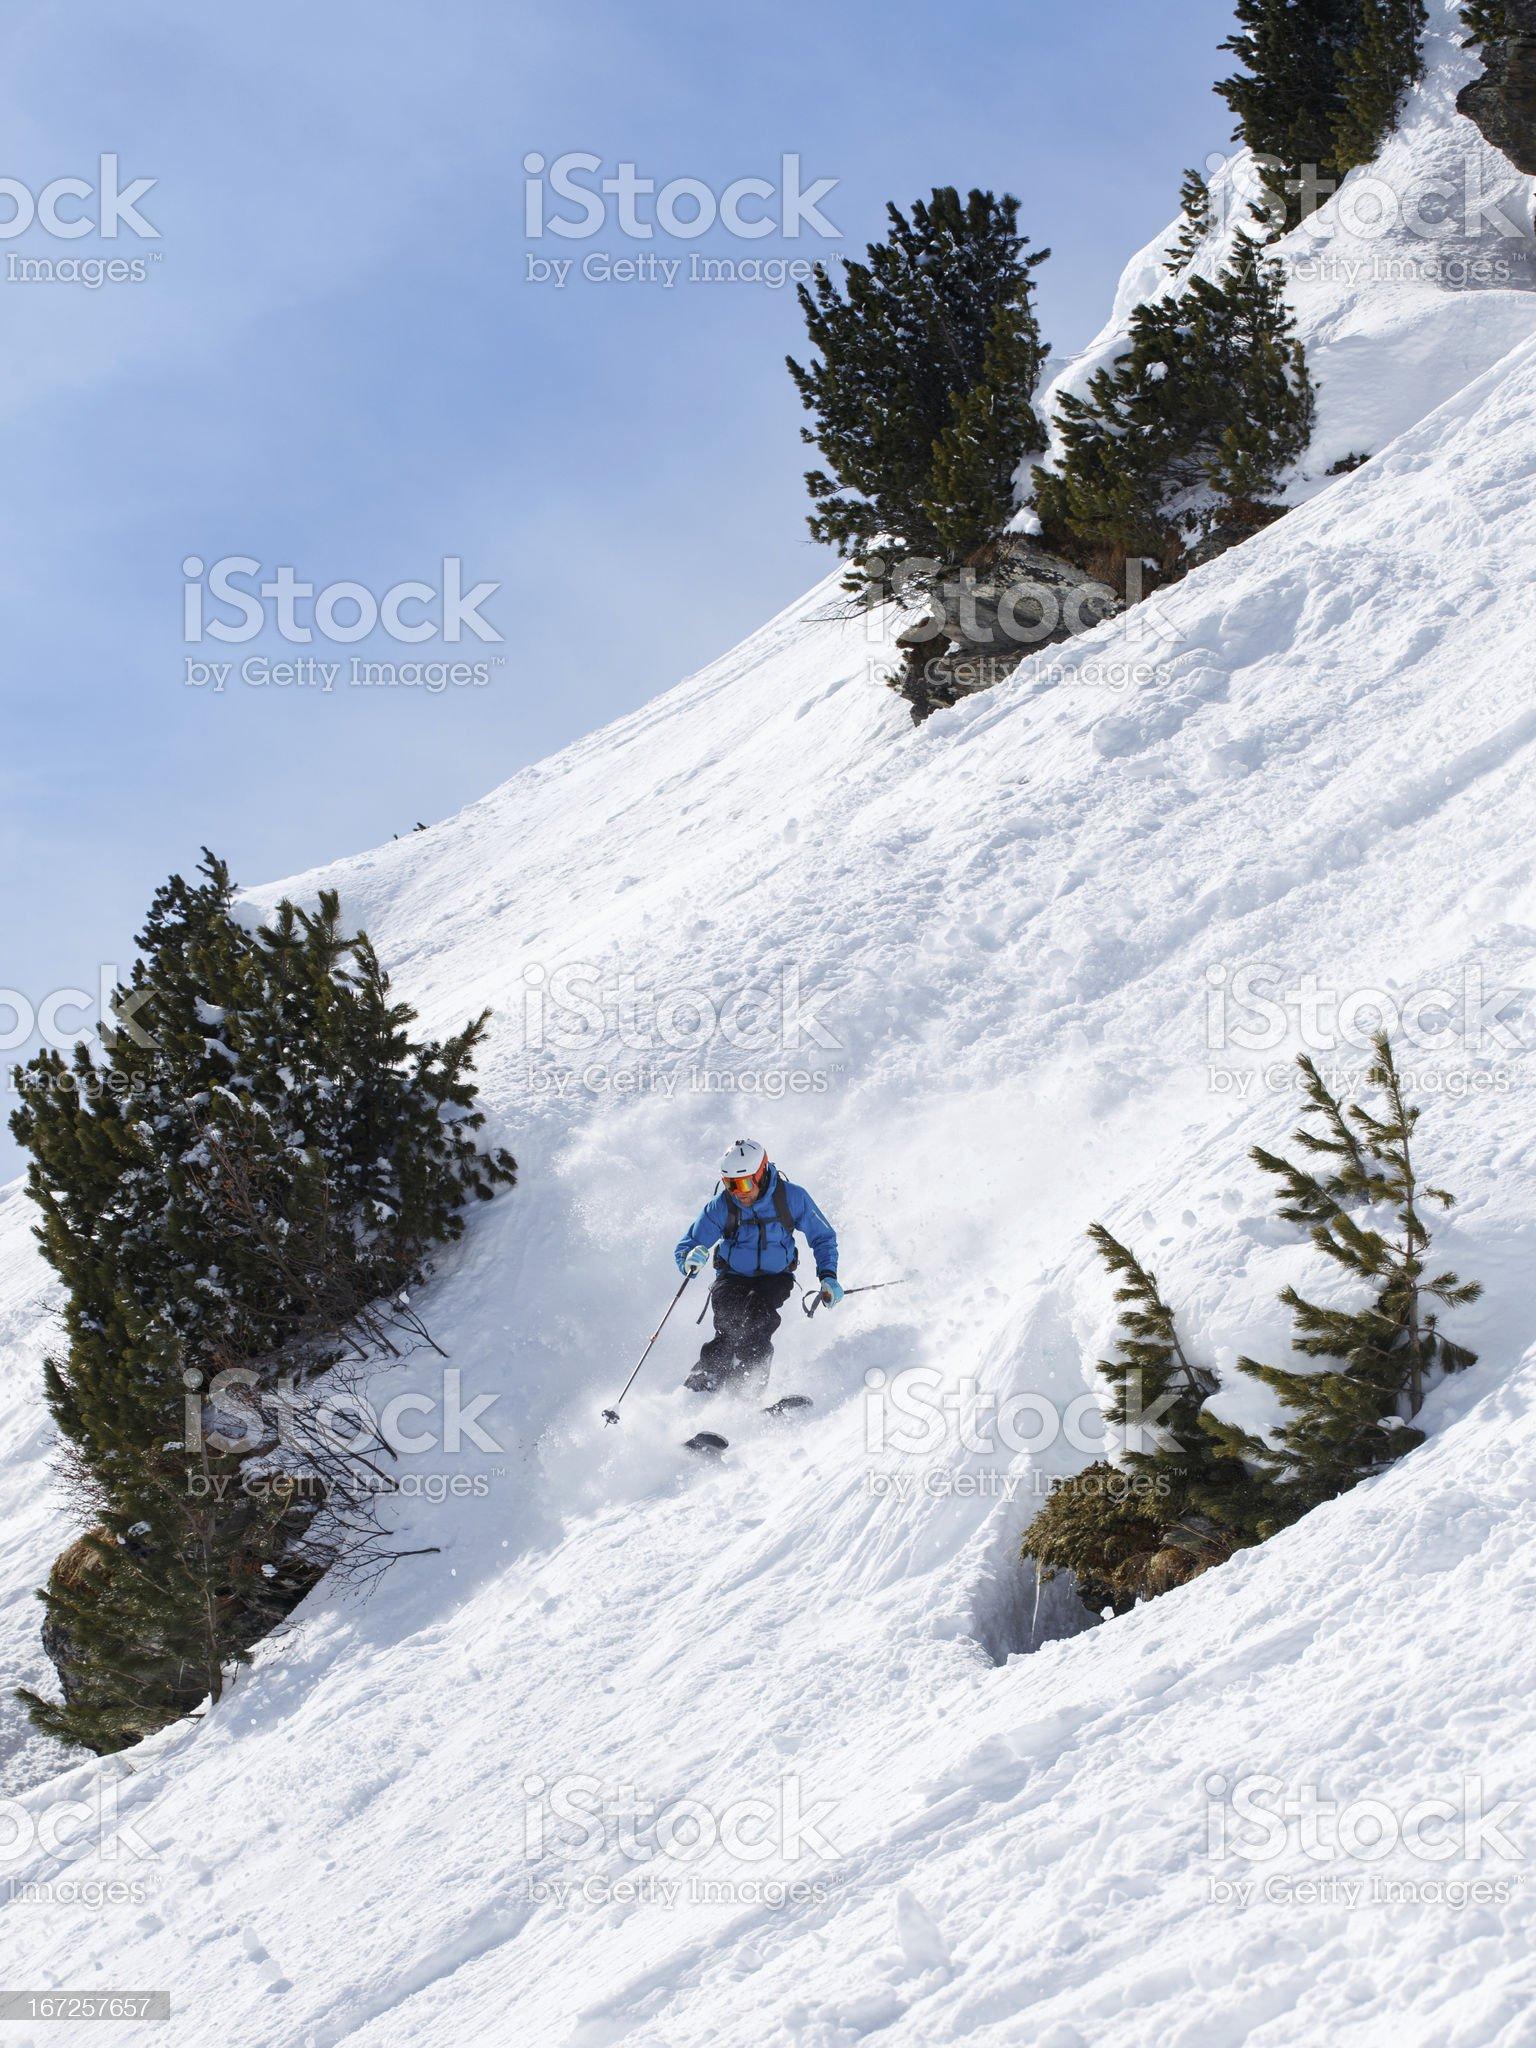 Skier making turn between trees royalty-free stock photo